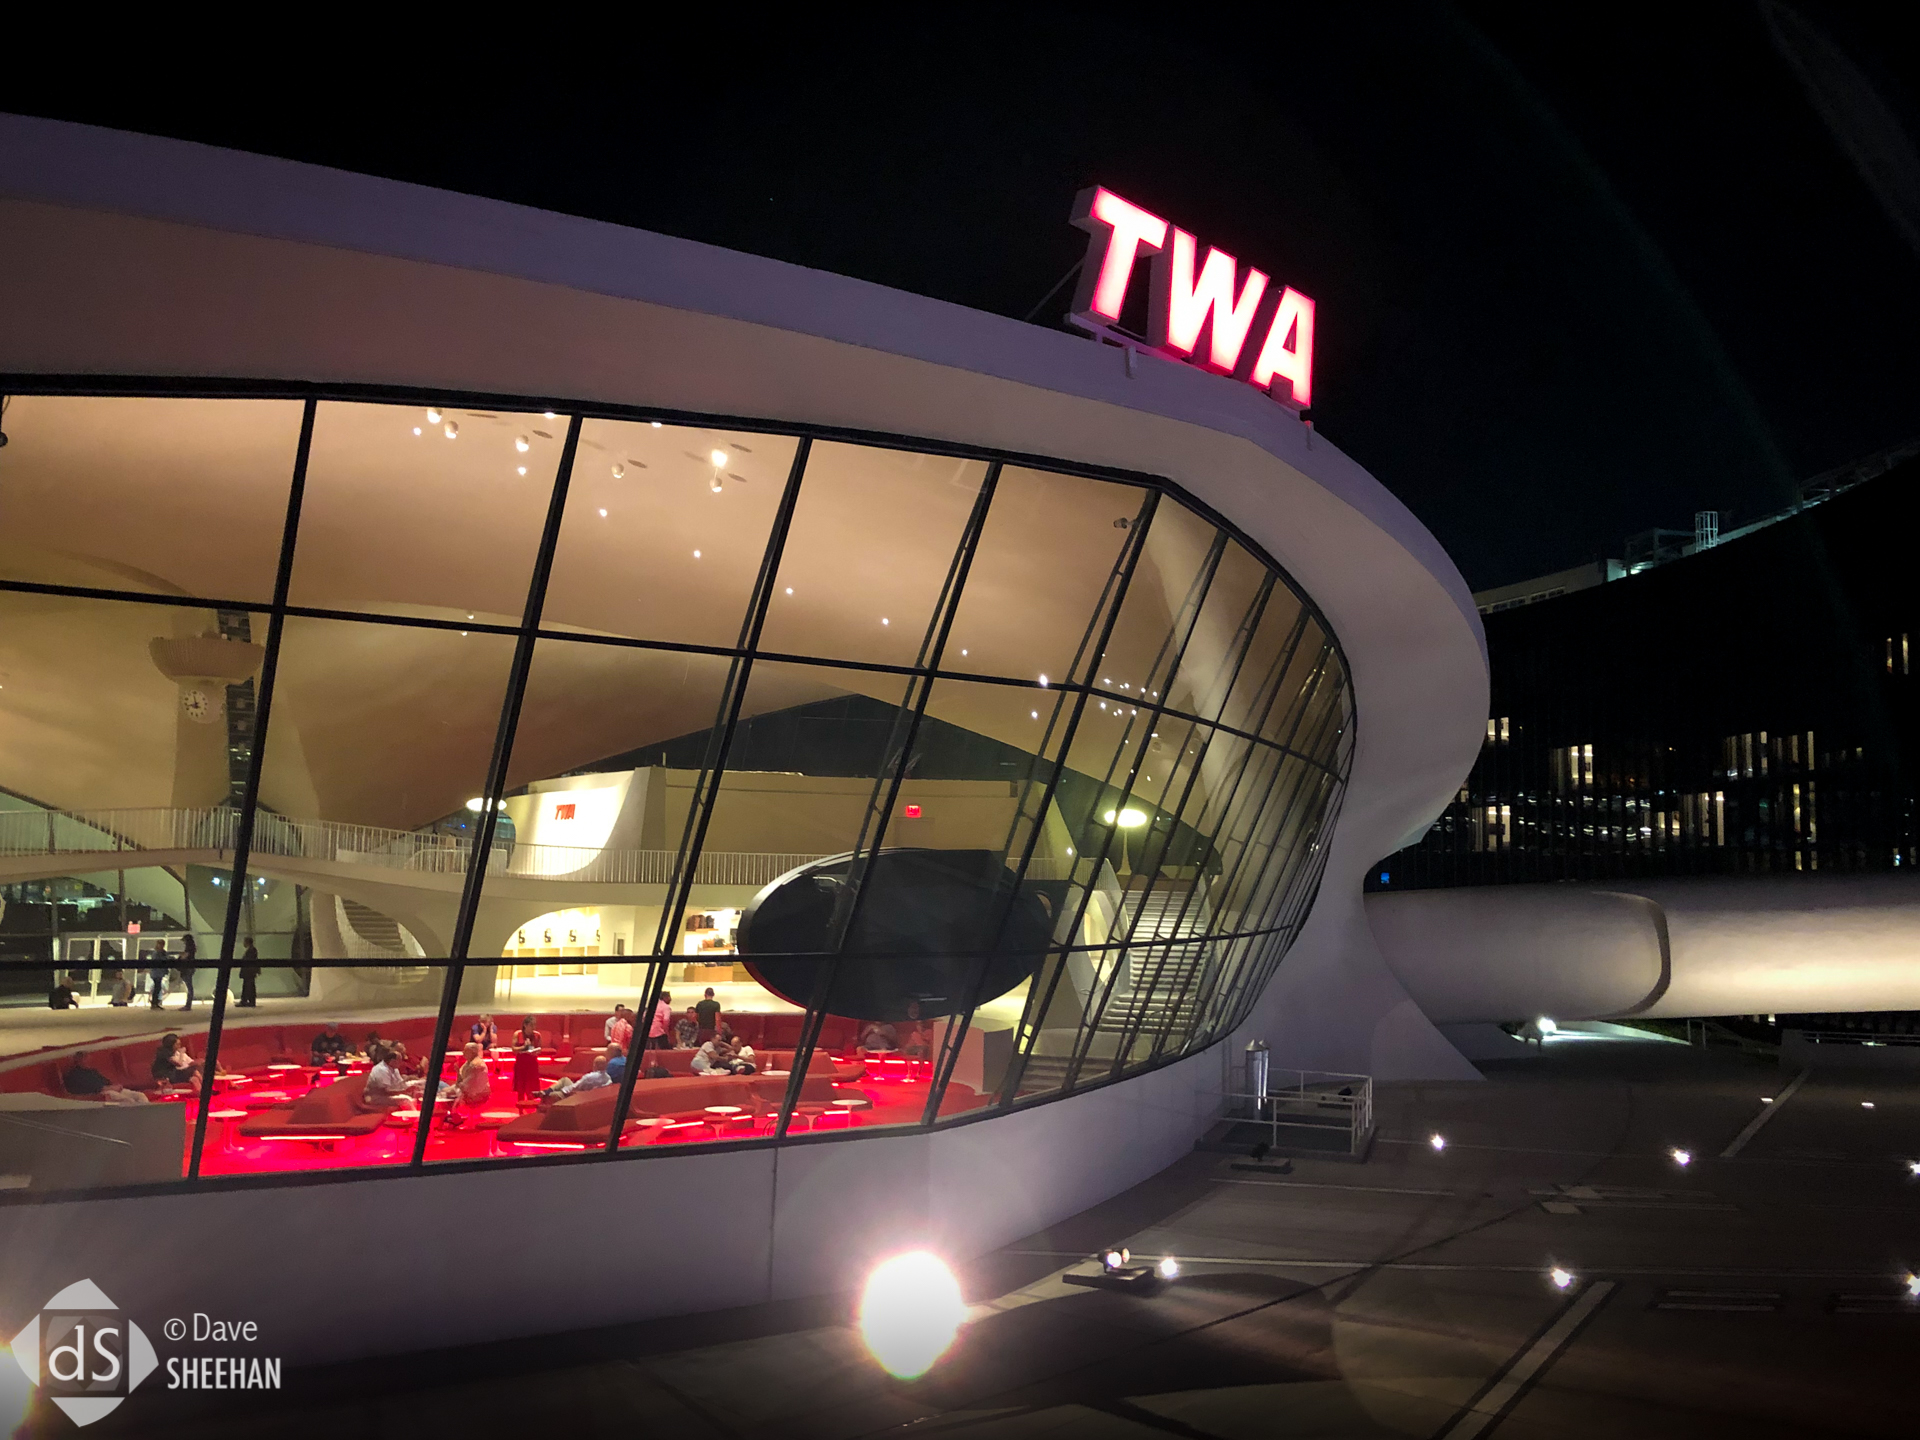 twa-hotel-jfk-1.jpg